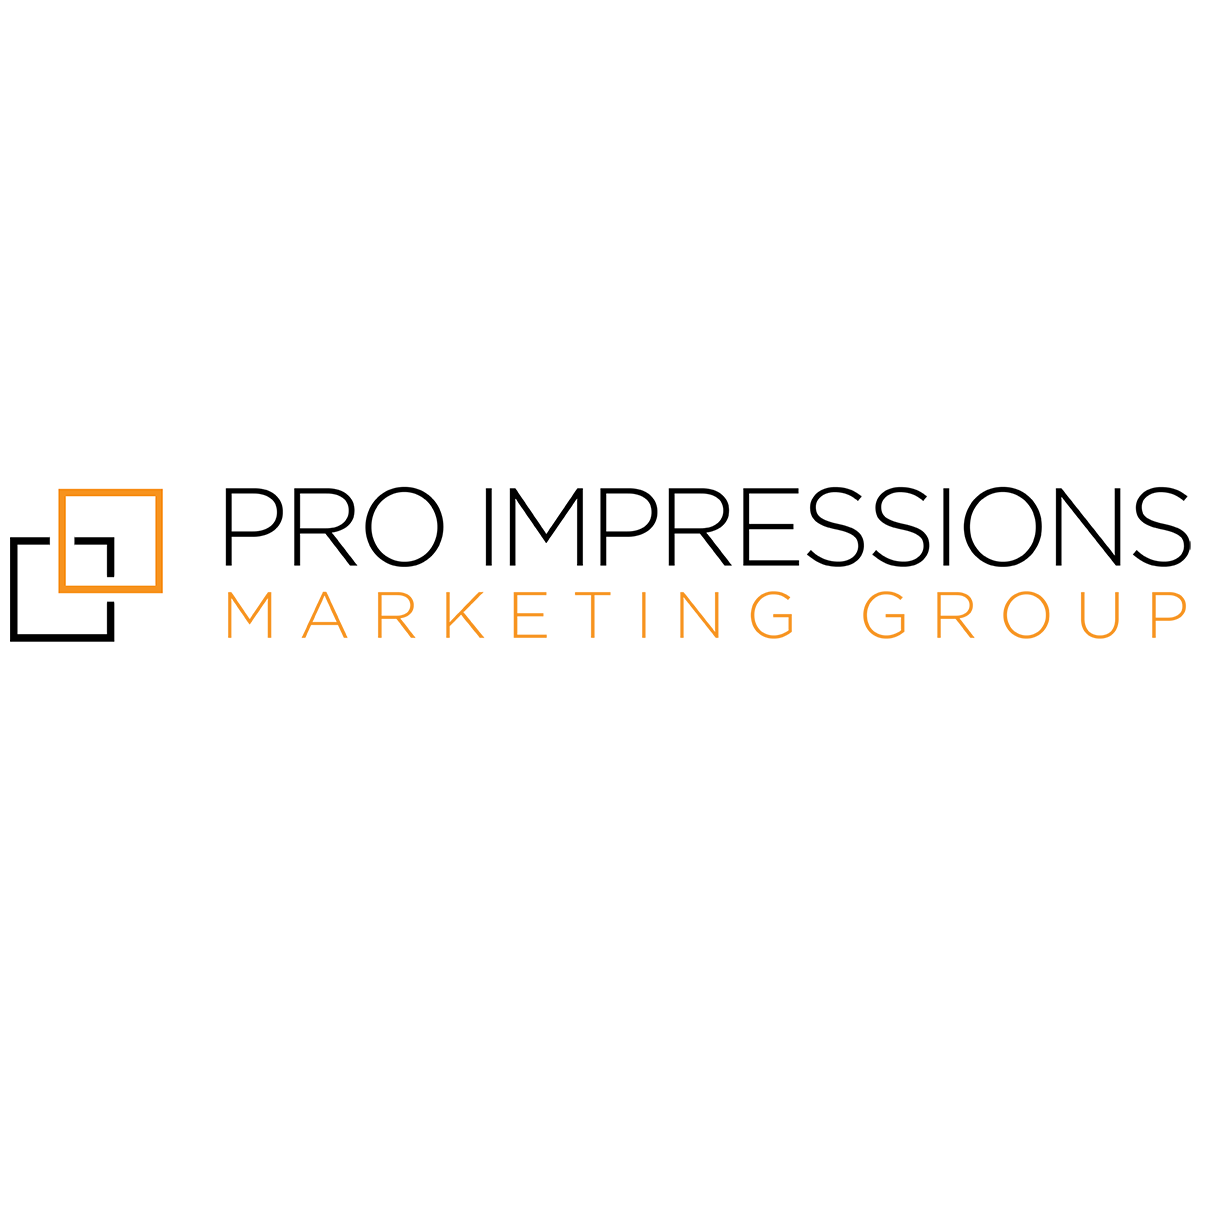 Pro Impressions Marketing Group - Loveland, CO 80538 - (970)672-1212 | ShowMeLocal.com